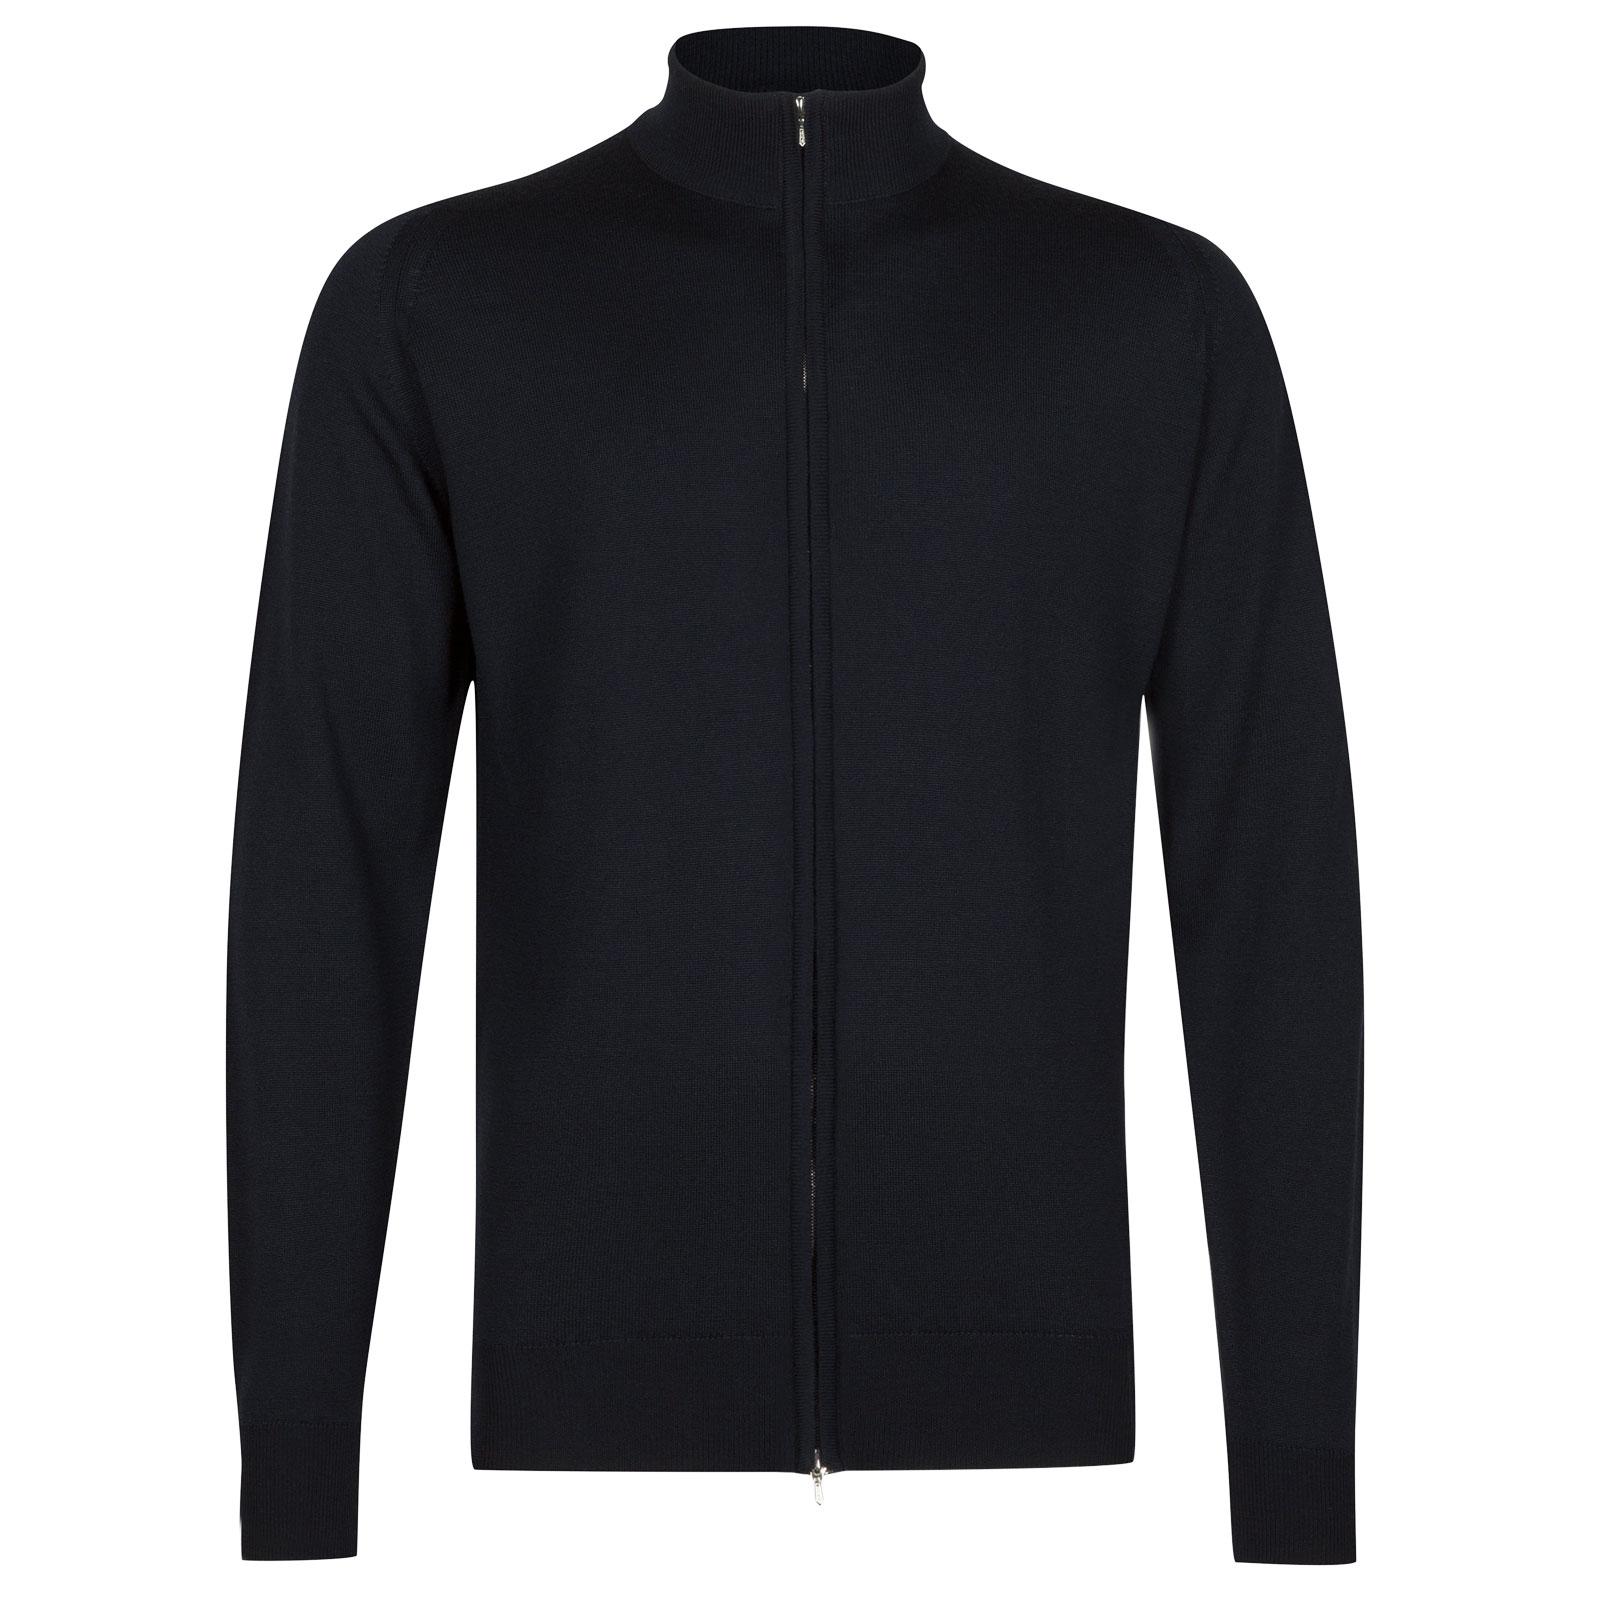 John Smedley claygate Merino Wool Jacket in Midnight-M